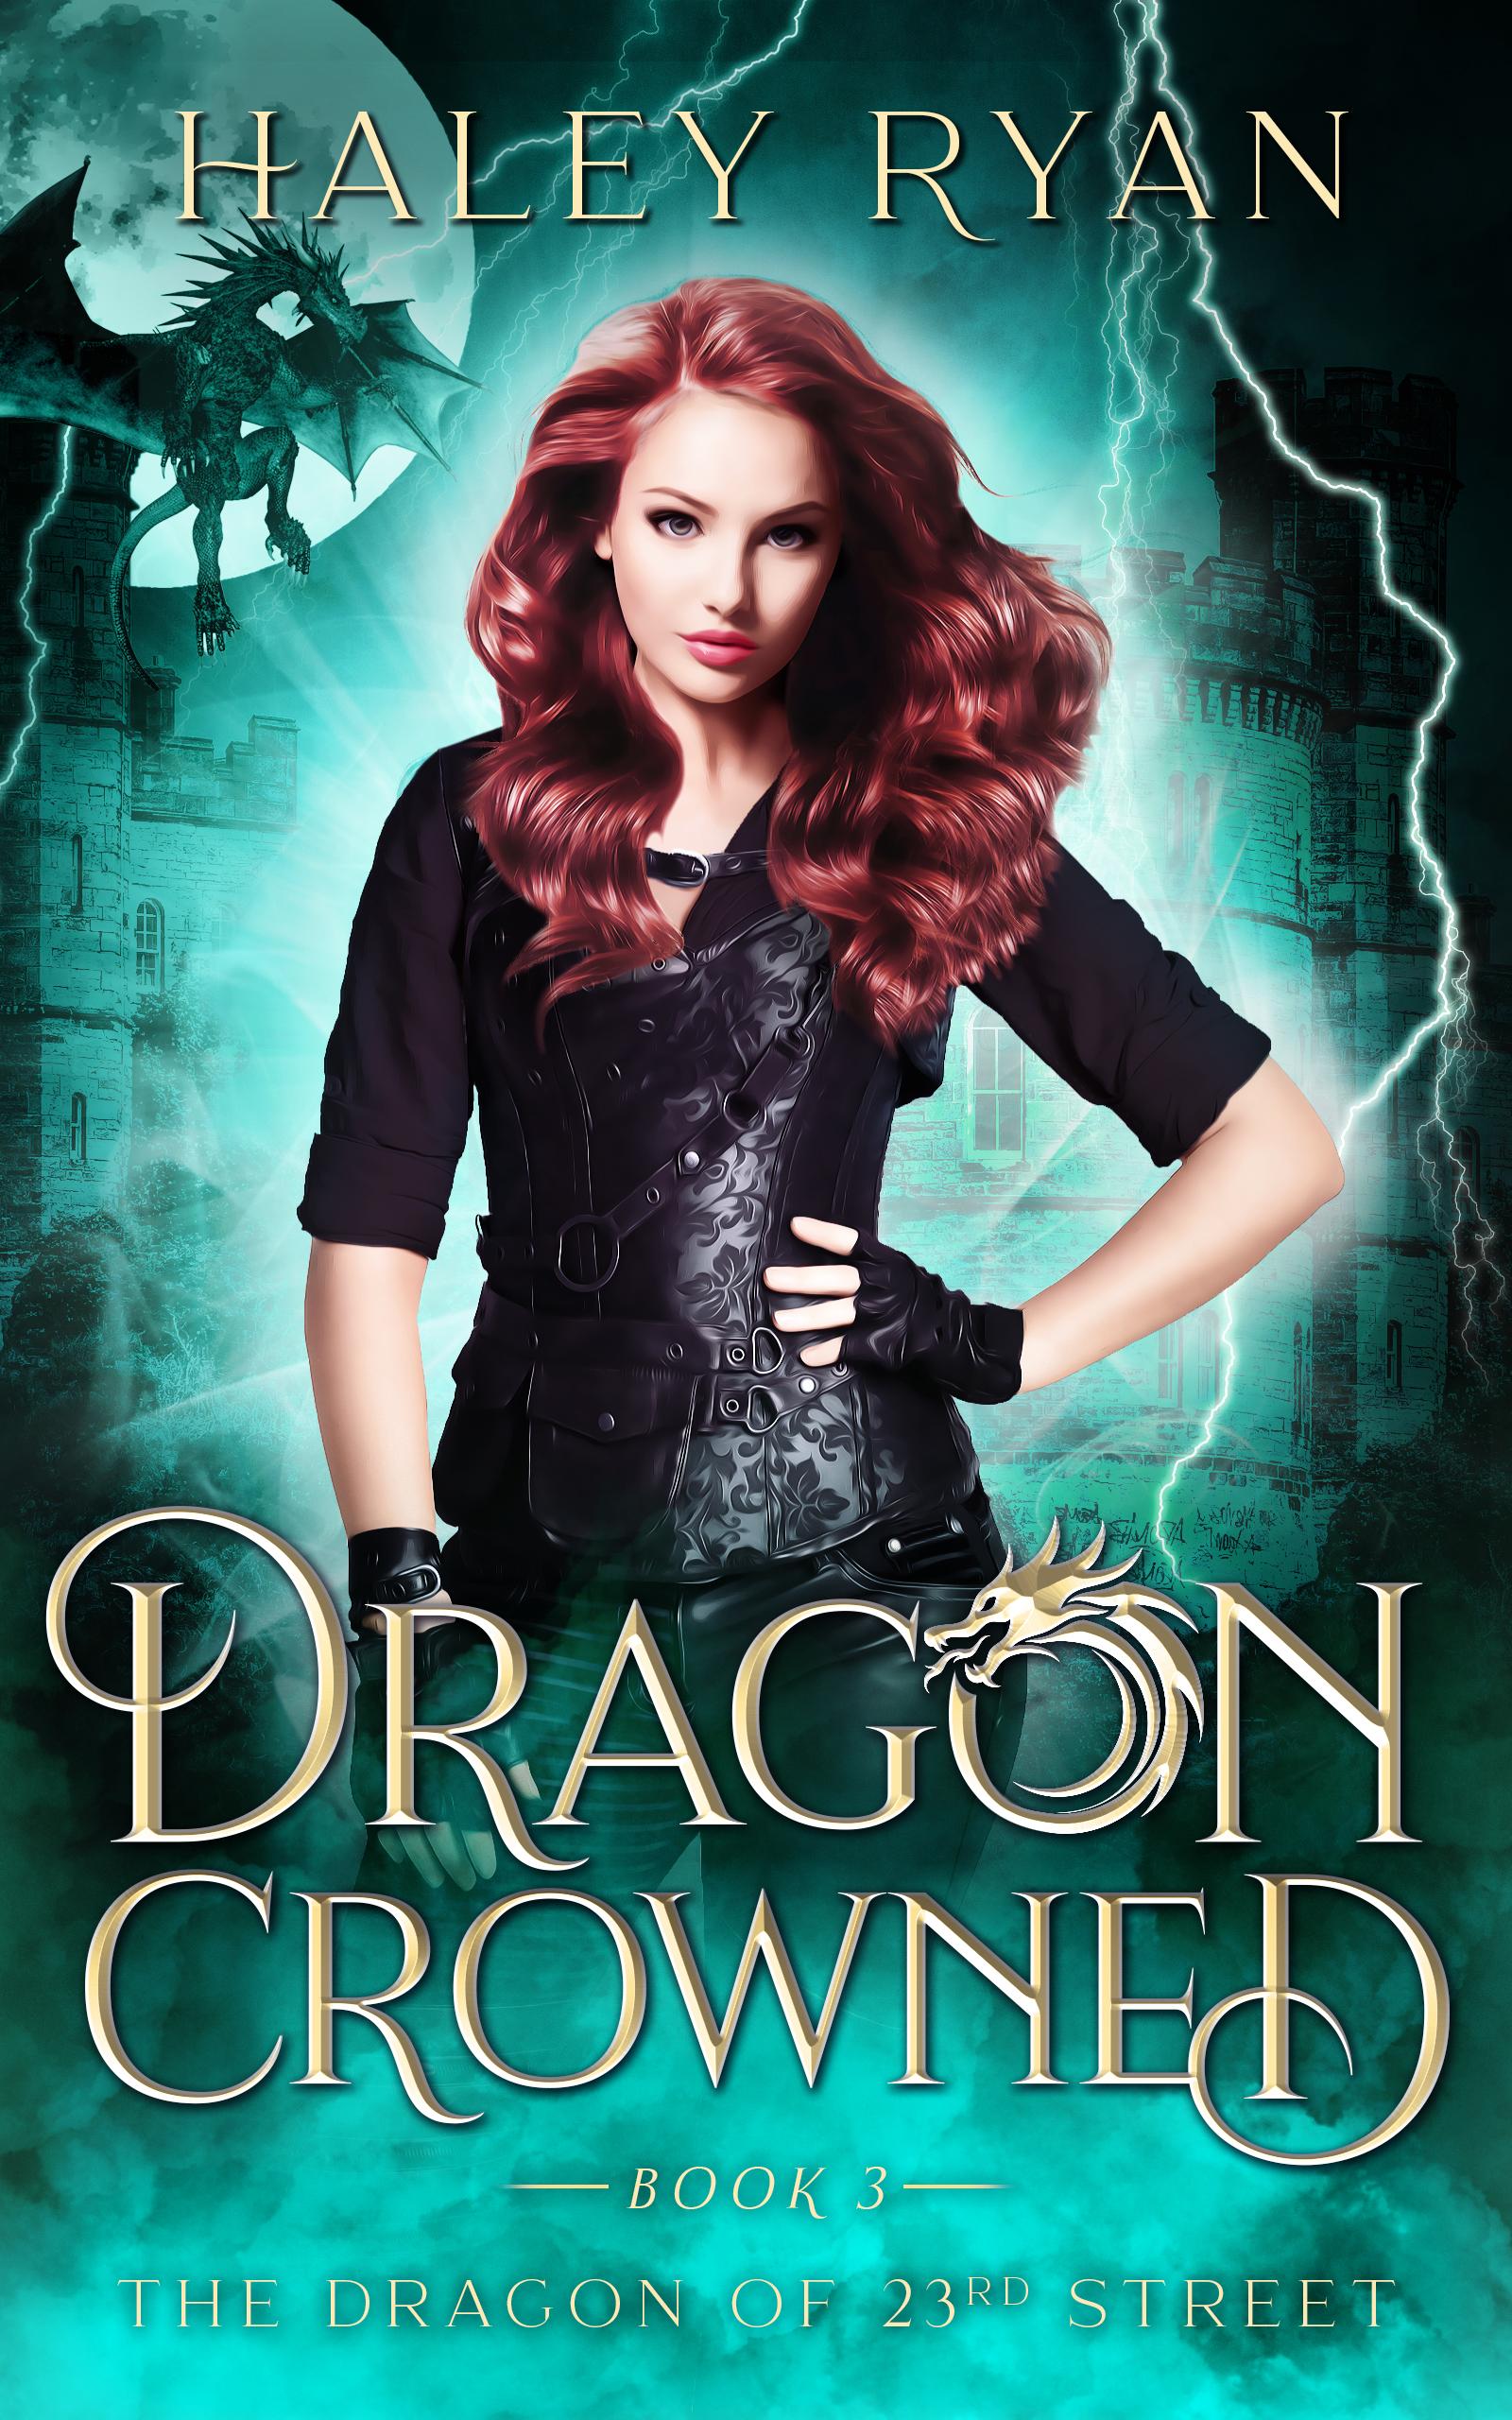 [PDF] [EPUB] Dragon Crowned (The Dragon of 23rd Street #3) Download by Haley Ryan